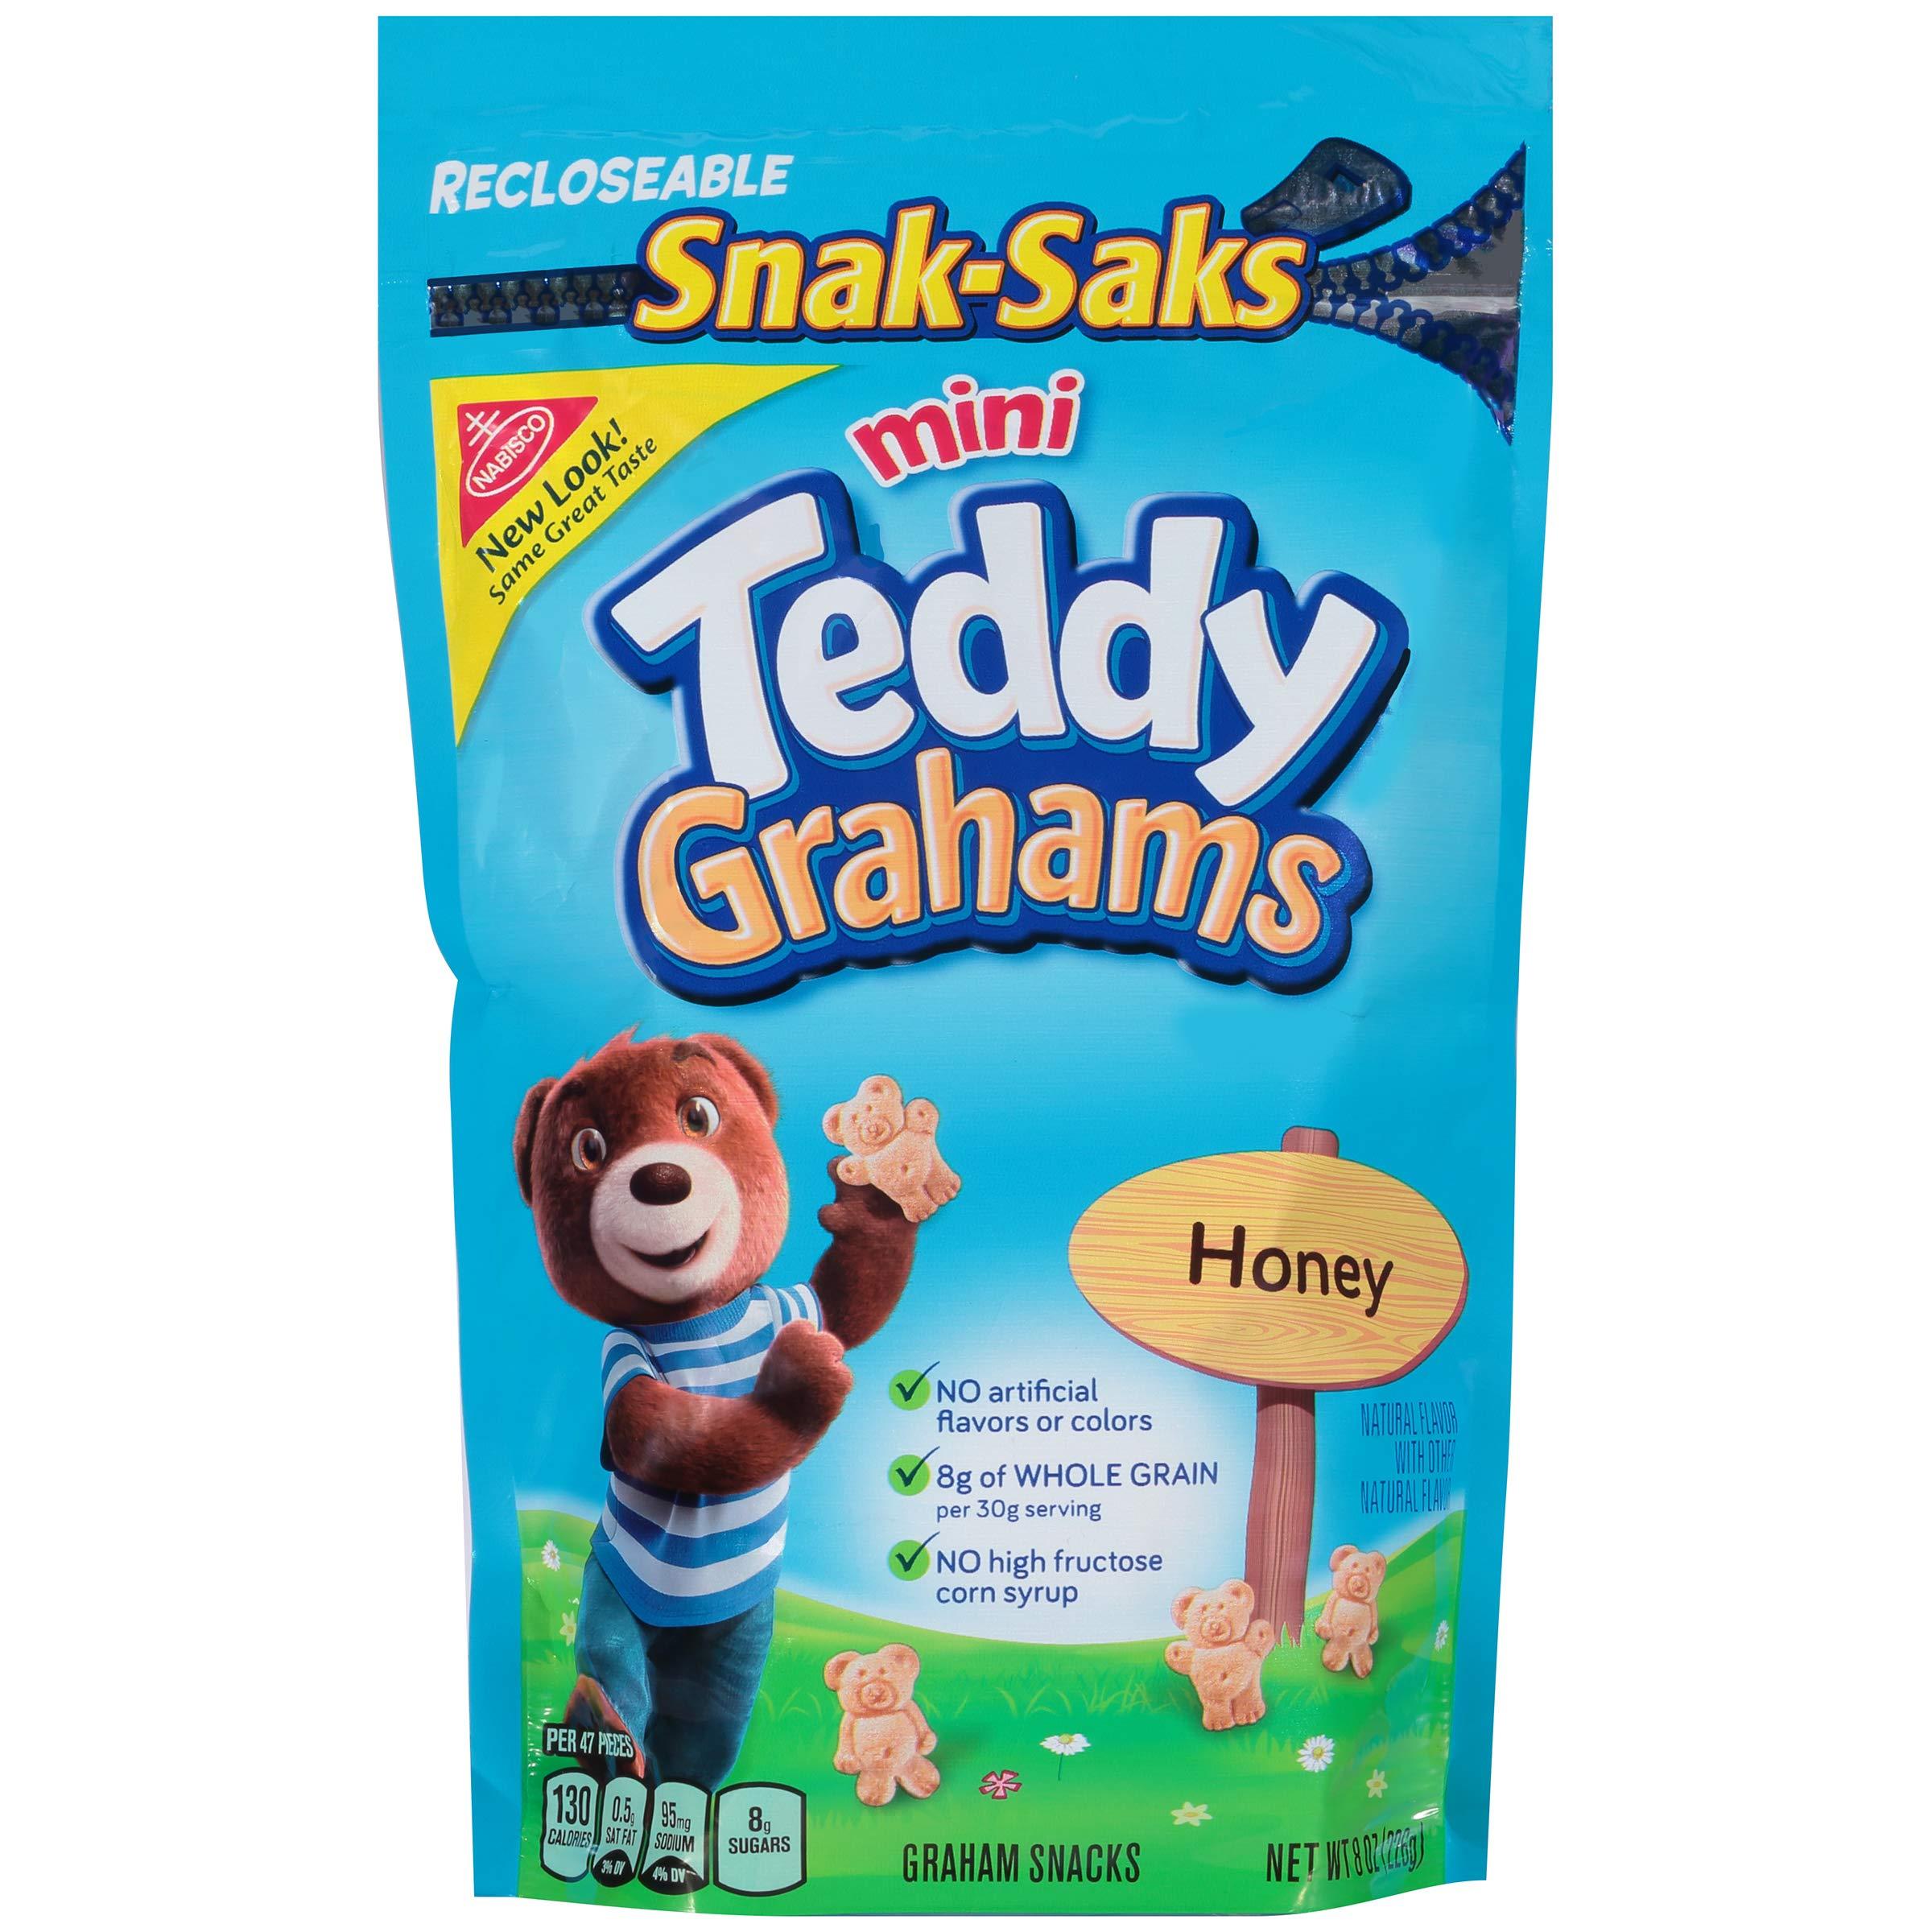 Teddy Grahams Honey Graham Snacks, Snack-Sak, 8 Ounce (Pack of 12) by Teddy Grahams